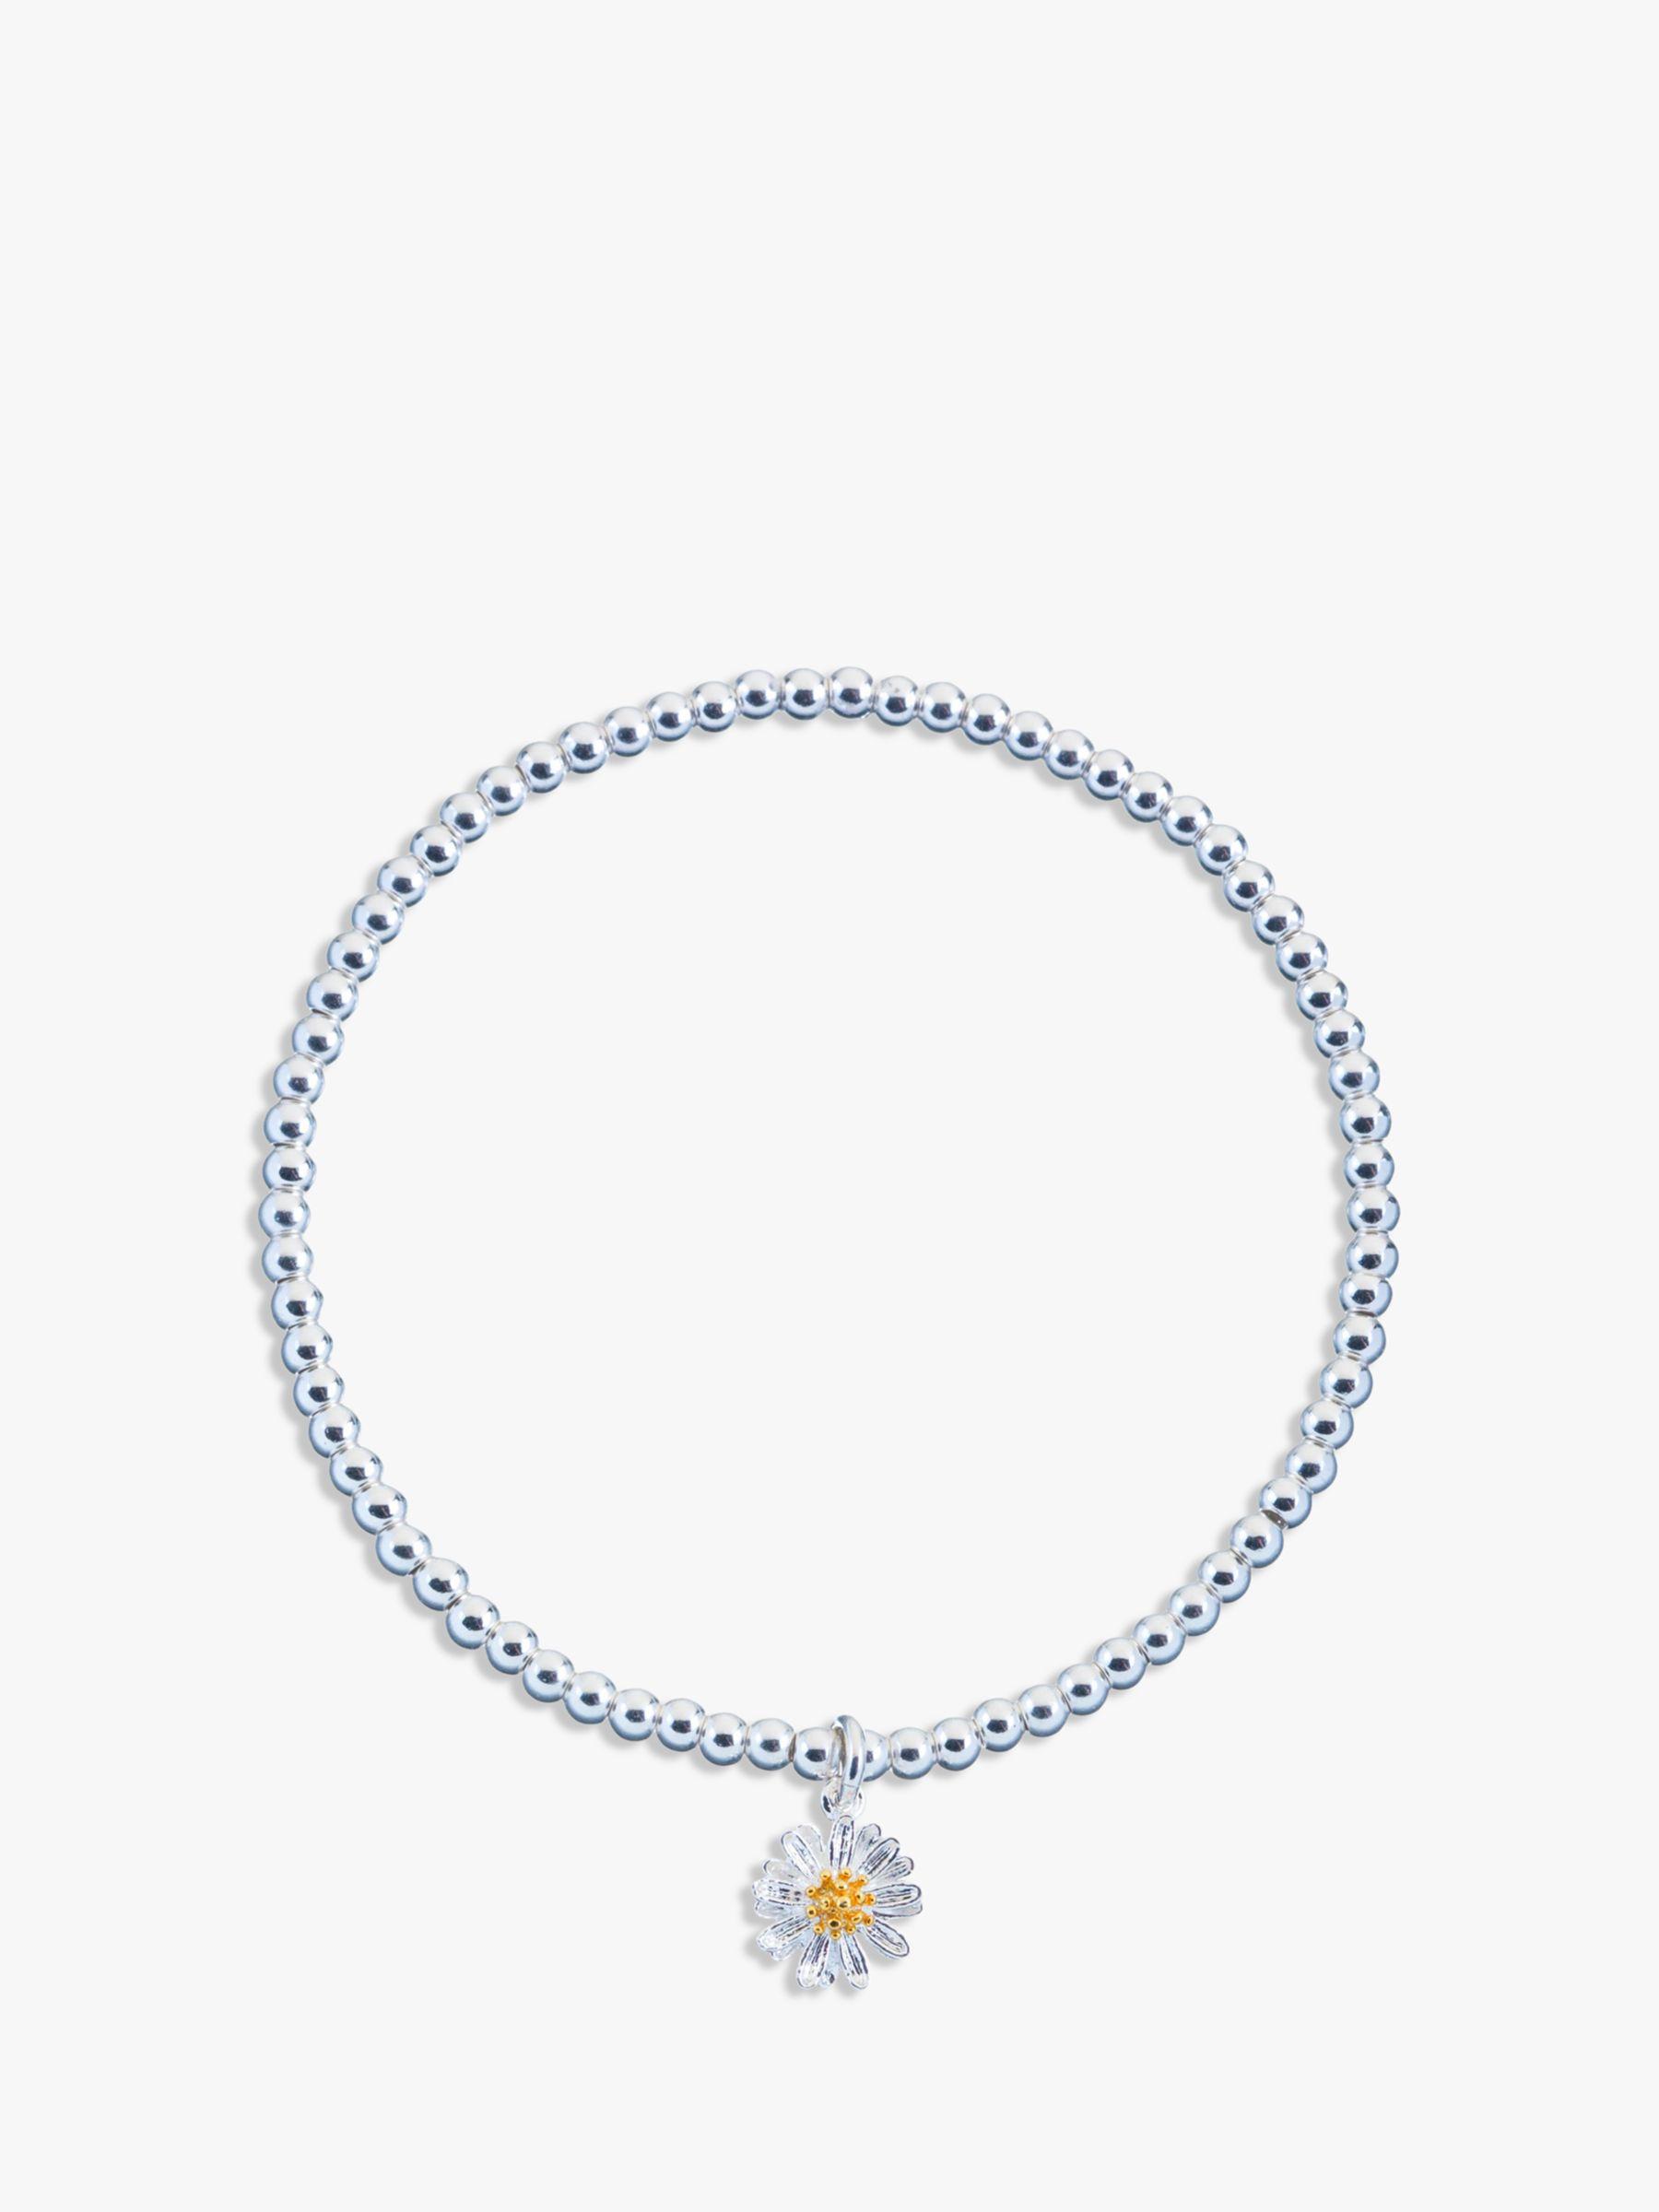 Estella Bartlett Estella Bartlett Sienna Flower Charm Stretch Bracelet, Silver